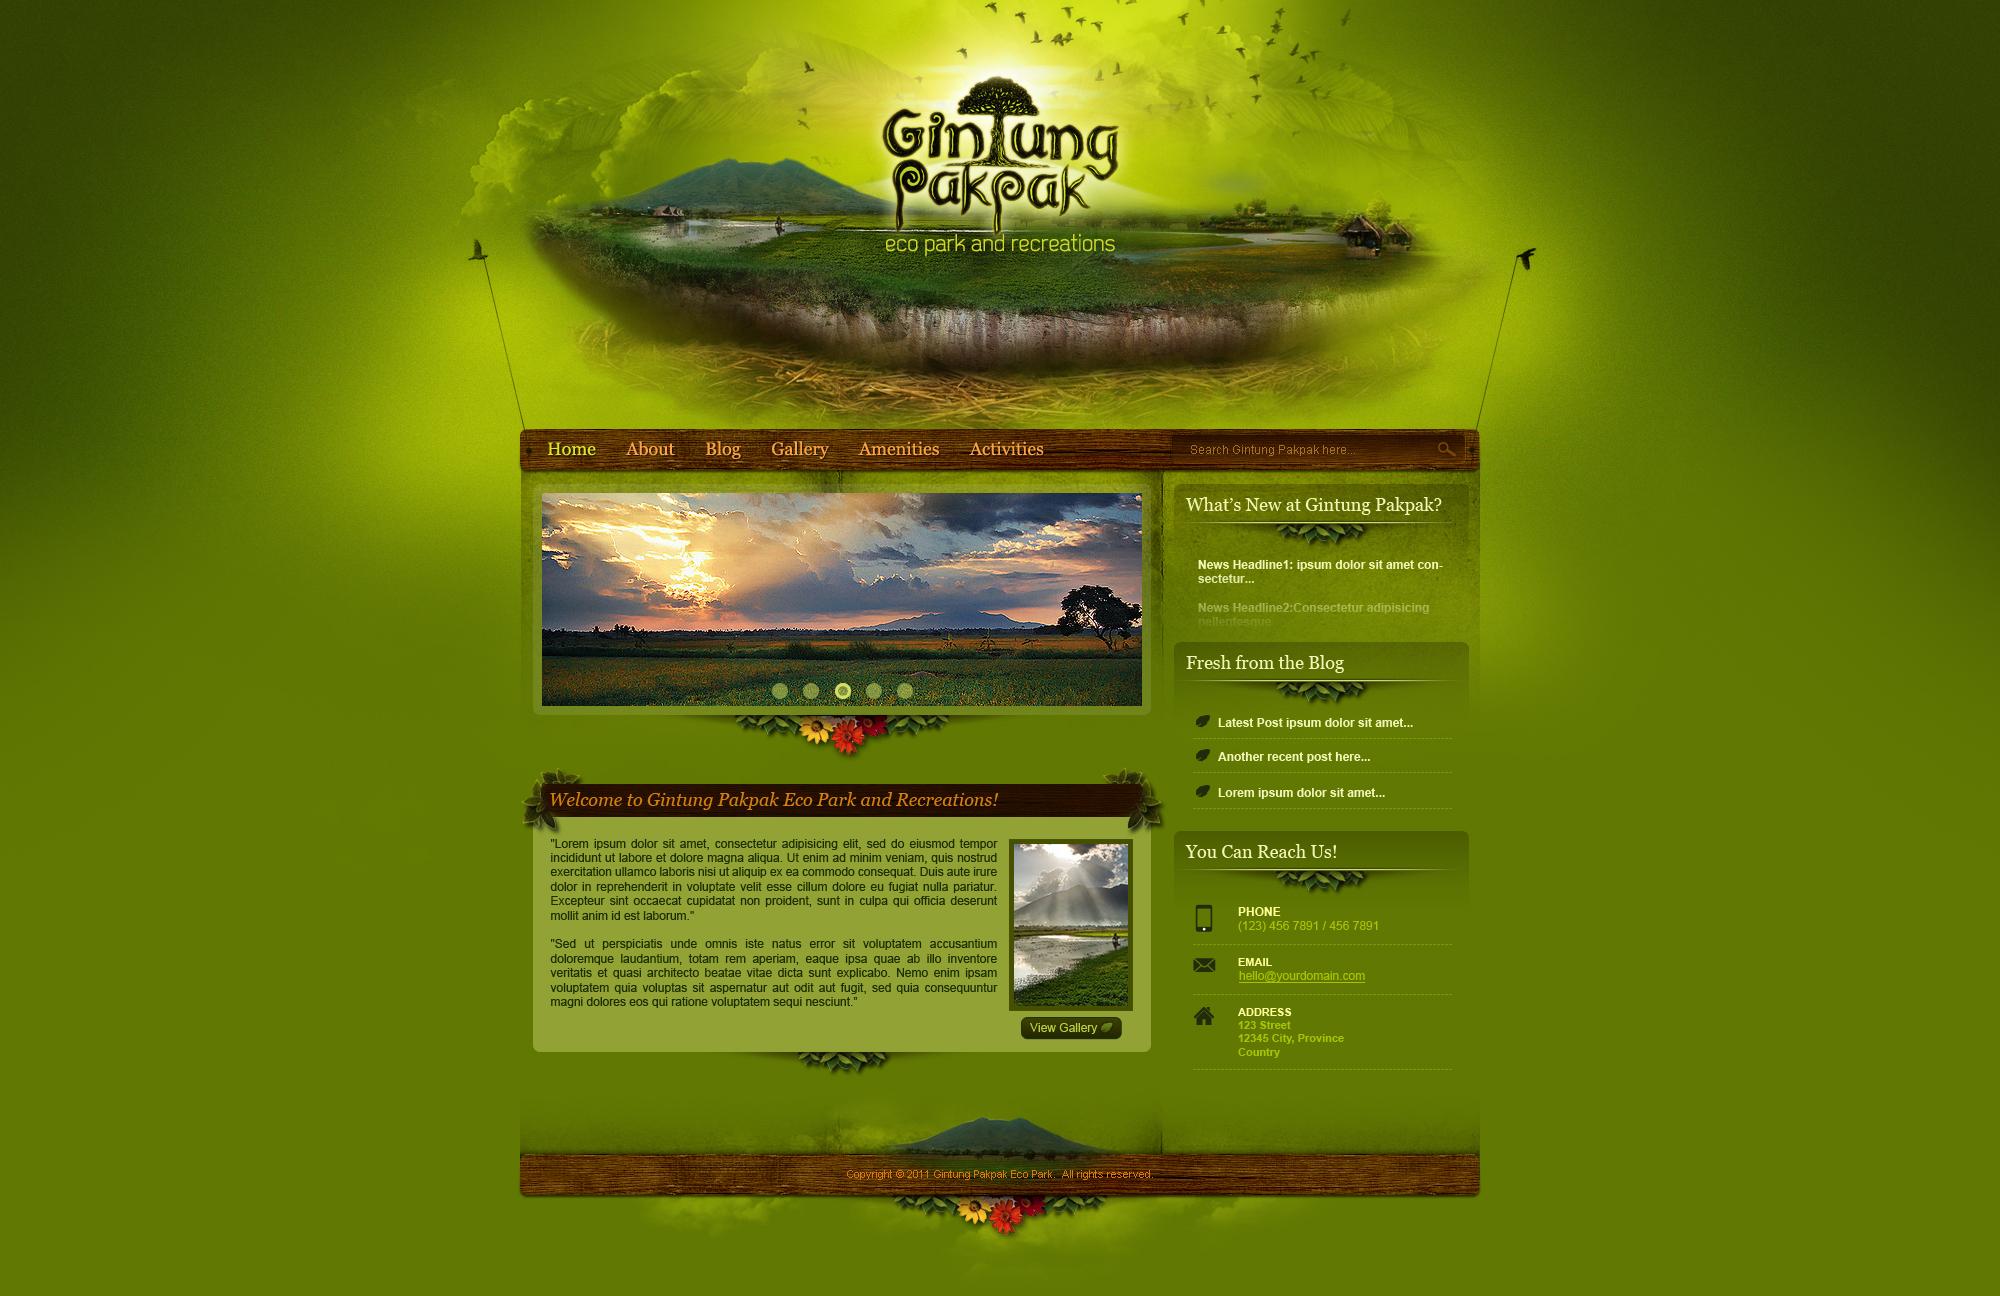 Gintung Pakpak Eco Park by bojok-mlsjr